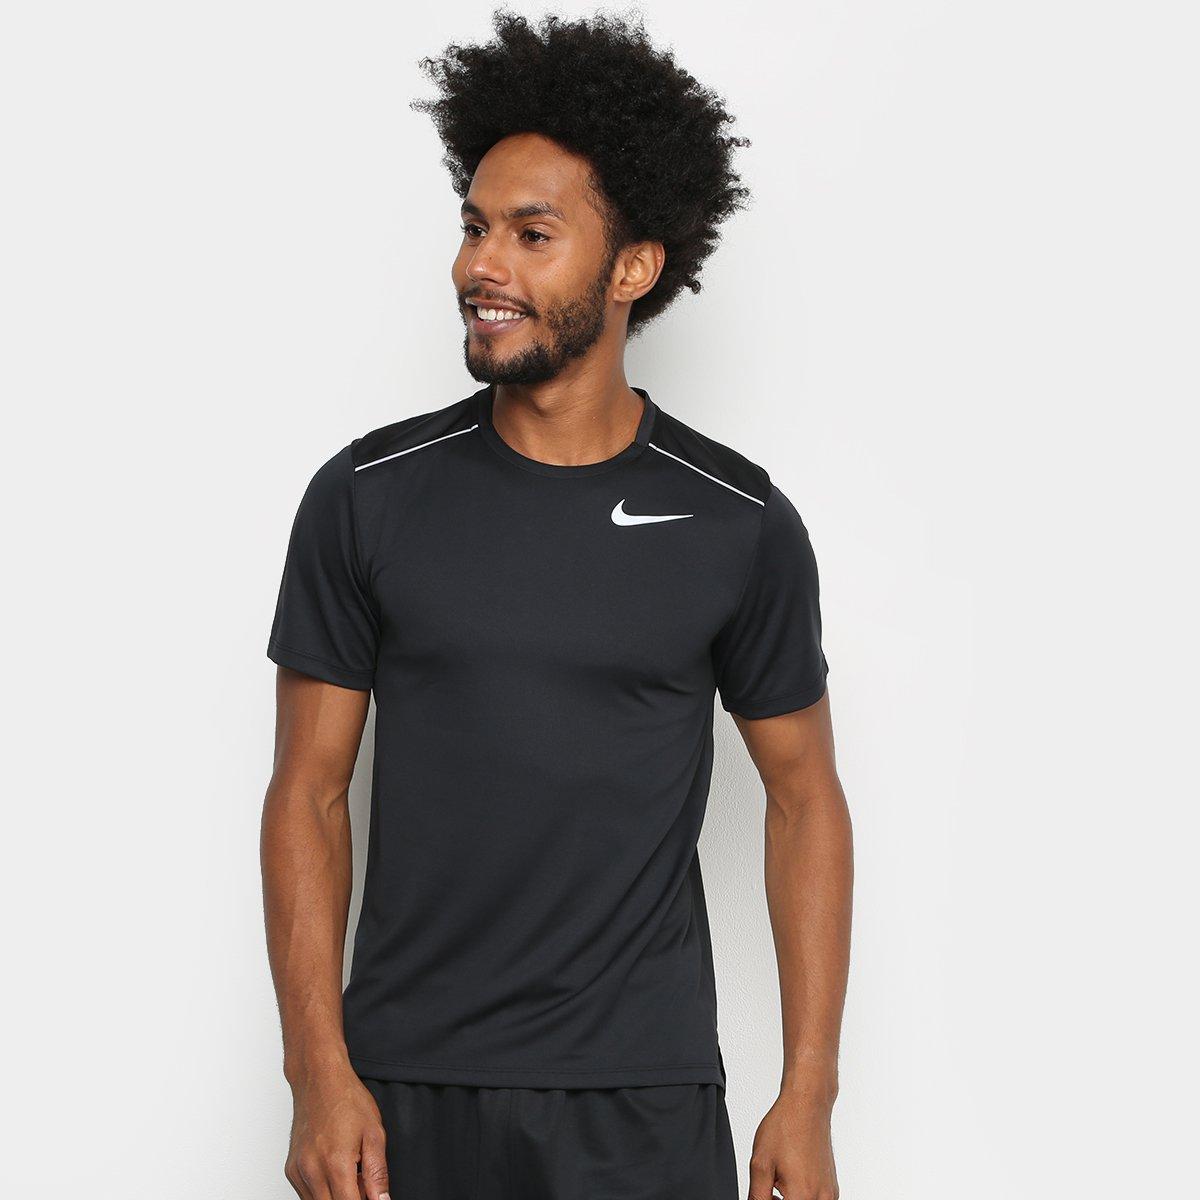 6f02888965 Camiseta Nike DRI-FIT Miler Mascunina - Preto | Shop Timão